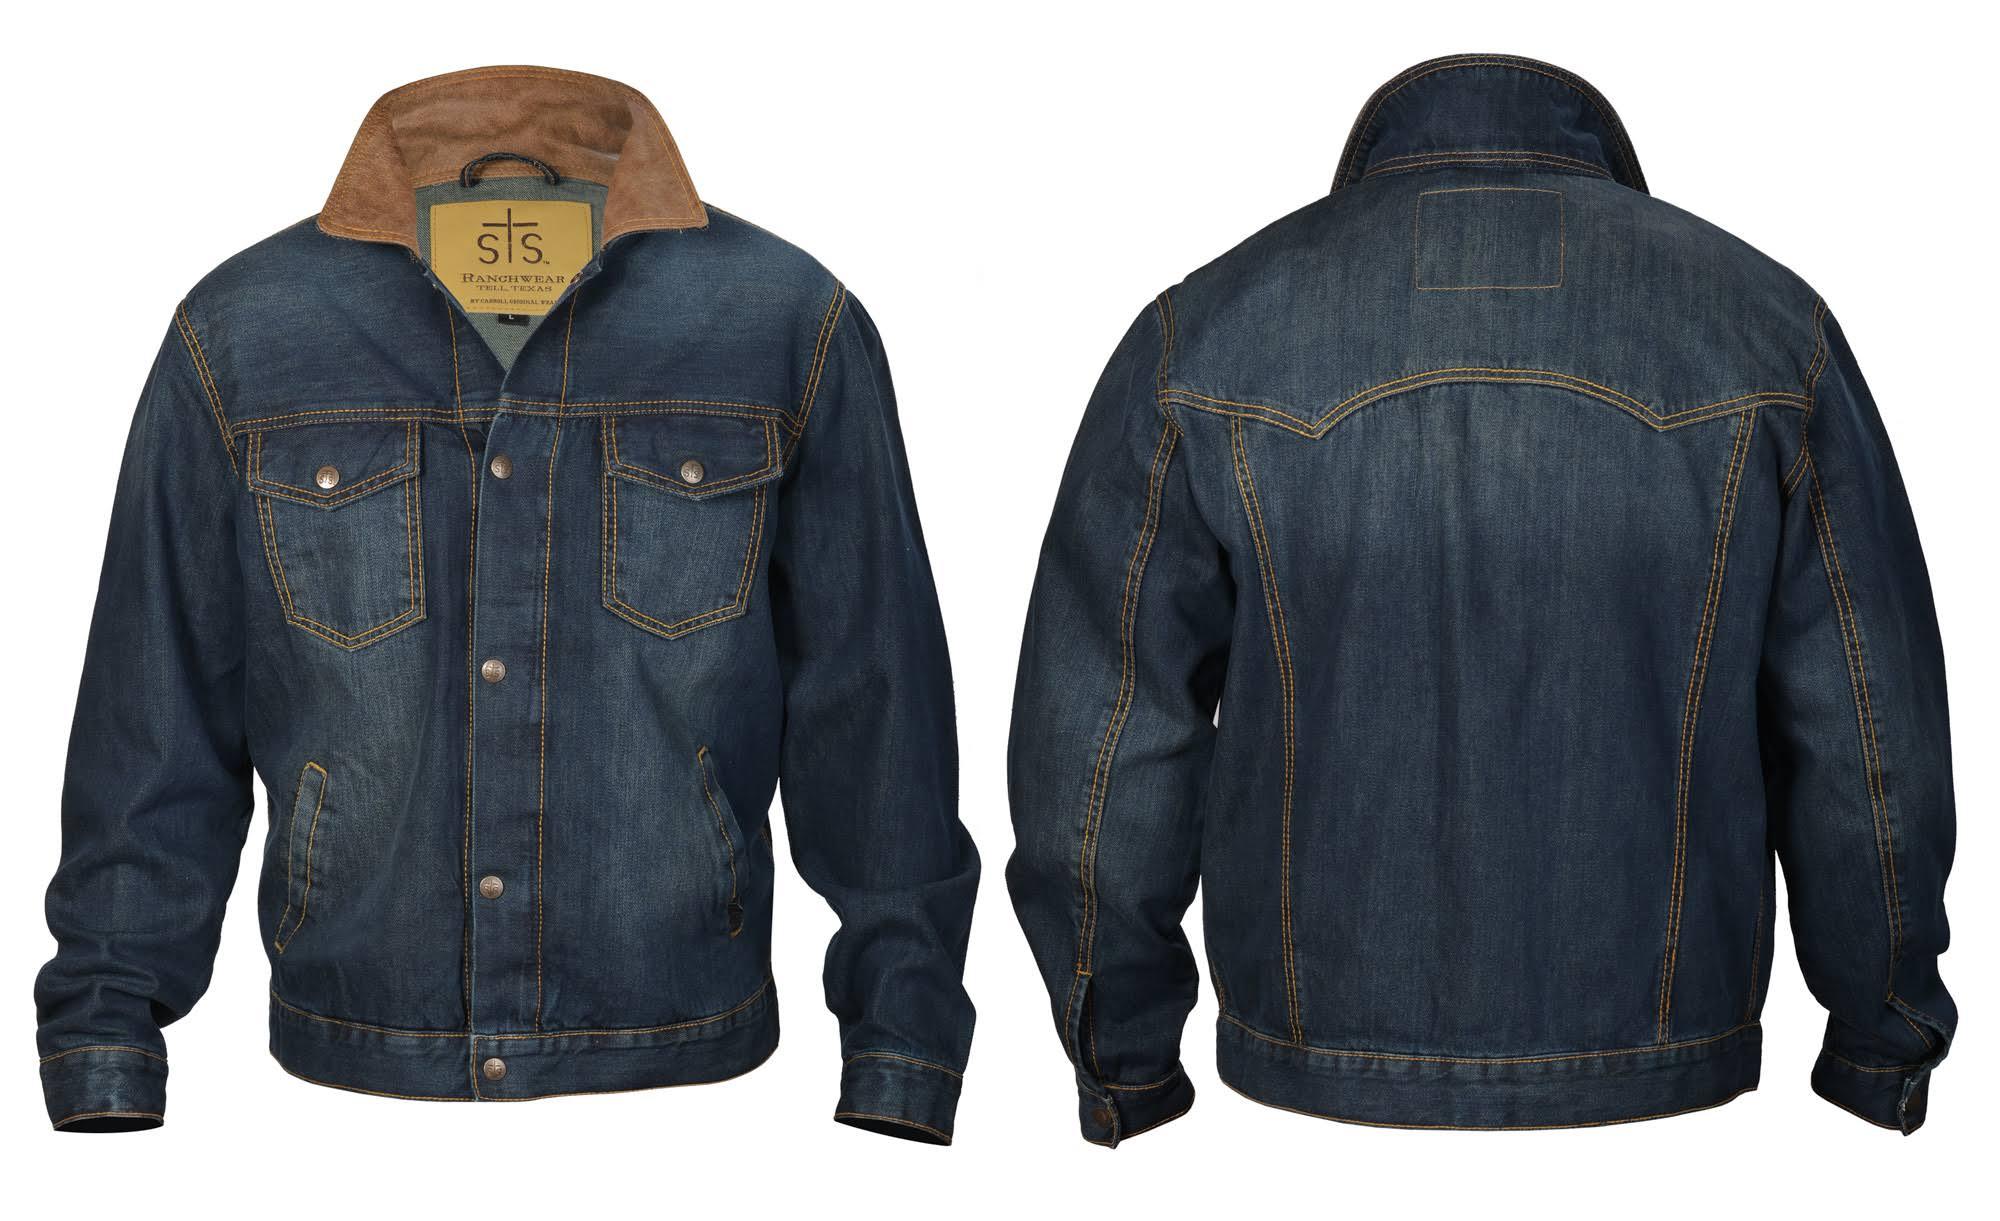 Jumper Denim Ranchwear Sts9765 Sts Herren Medium 4xl Westernjacke qp4w7t7xB